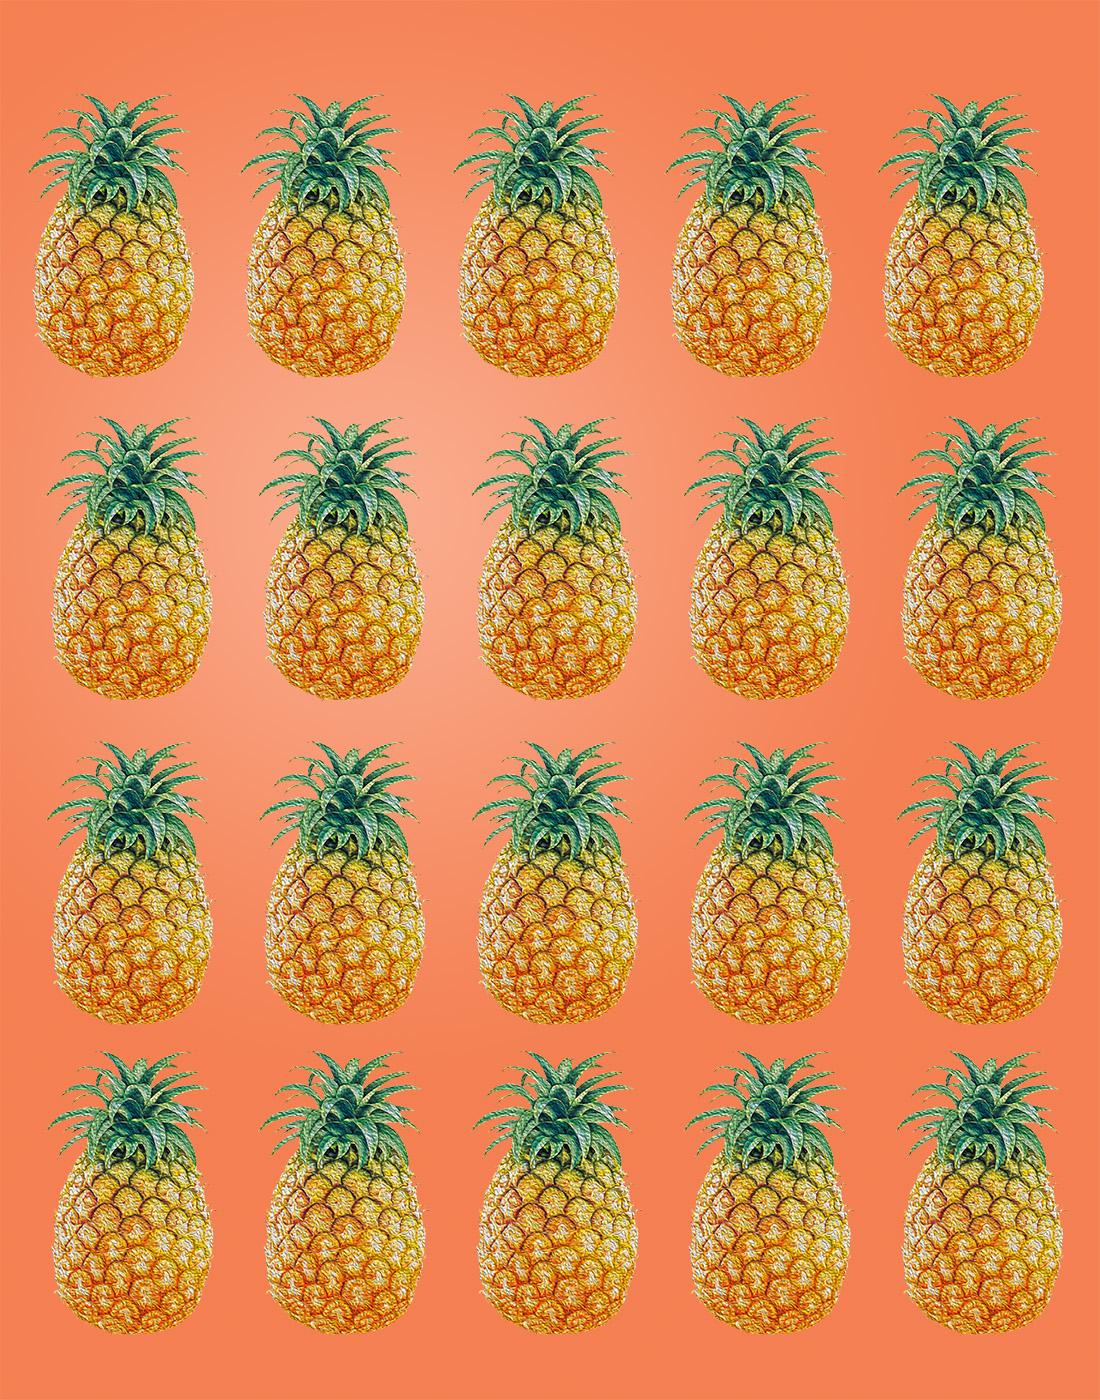 banana leaf wallpaper charlotte anabar 1100x1400